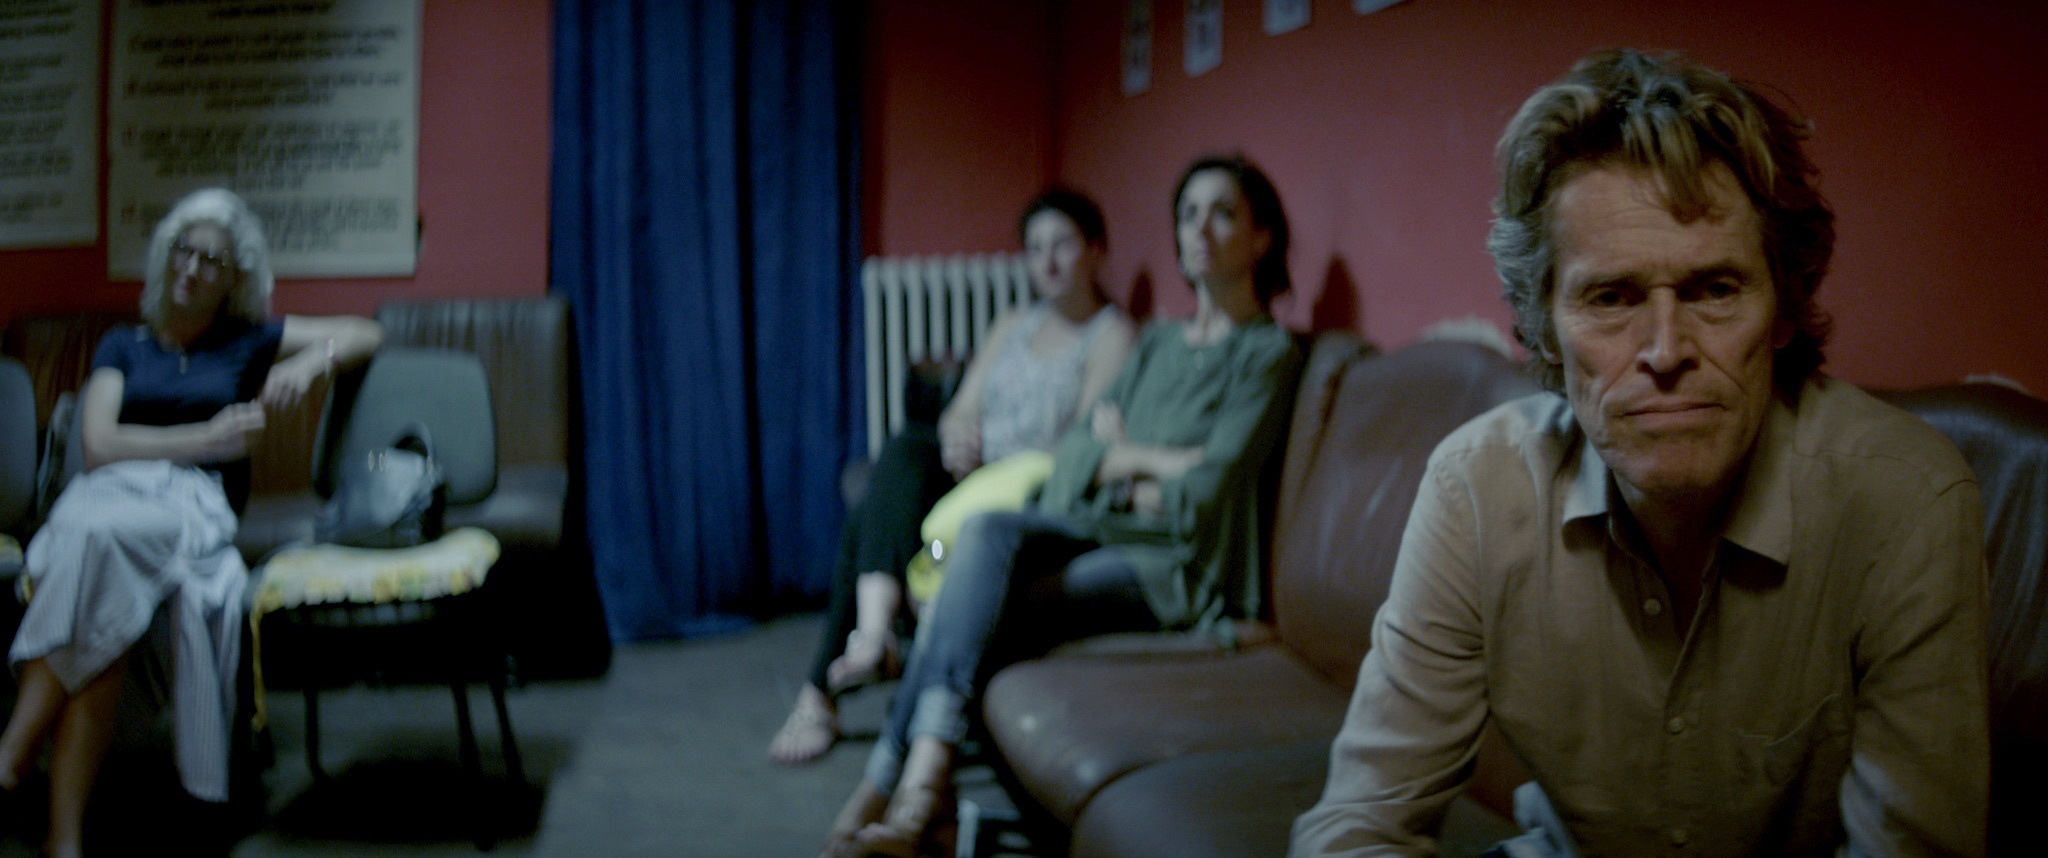 Willem Dafoe stars in Abel Ferrara's newest film